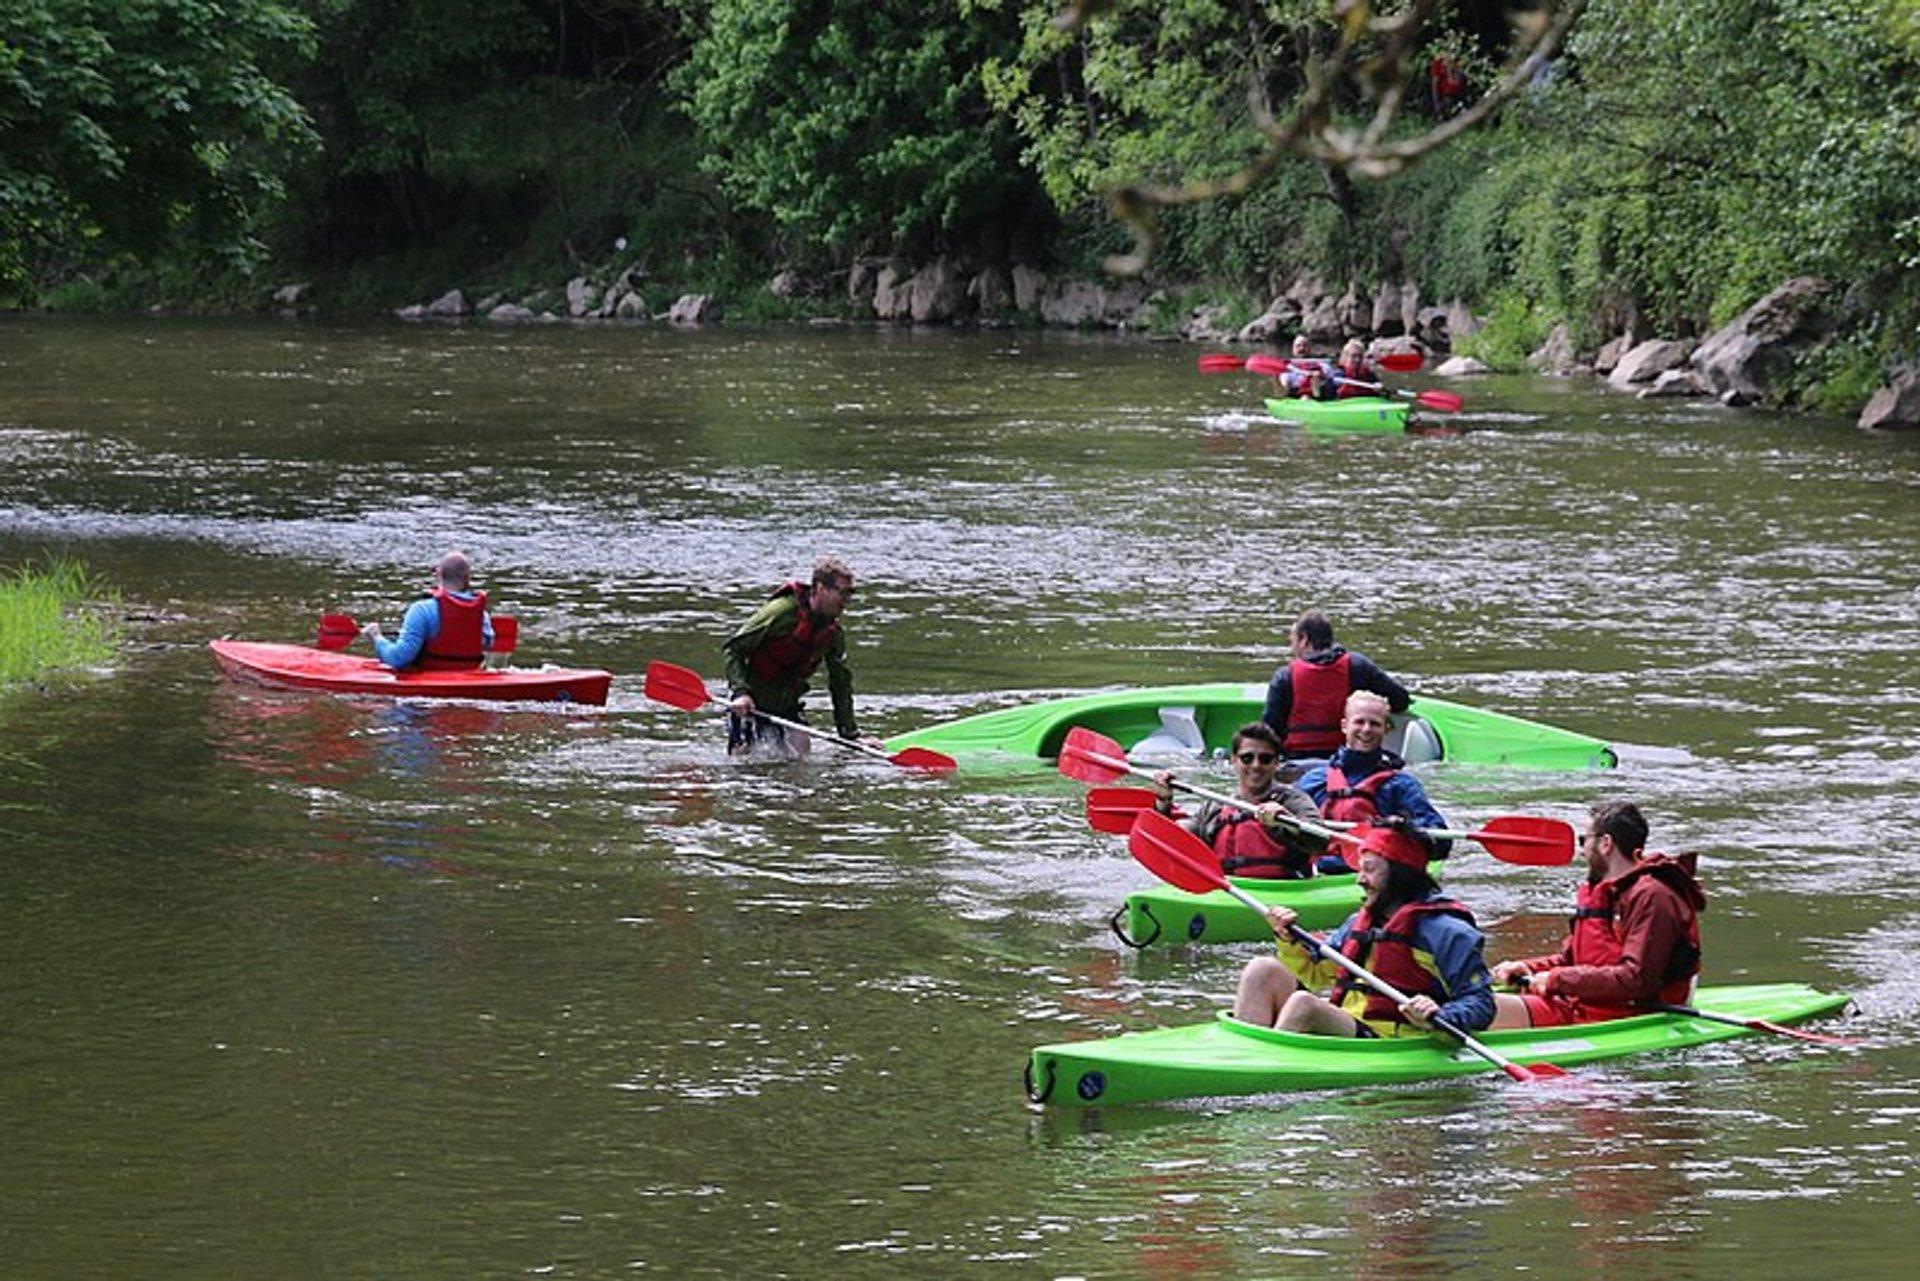 Kayaking & Canoeing in Belgium 2020 - Best Time